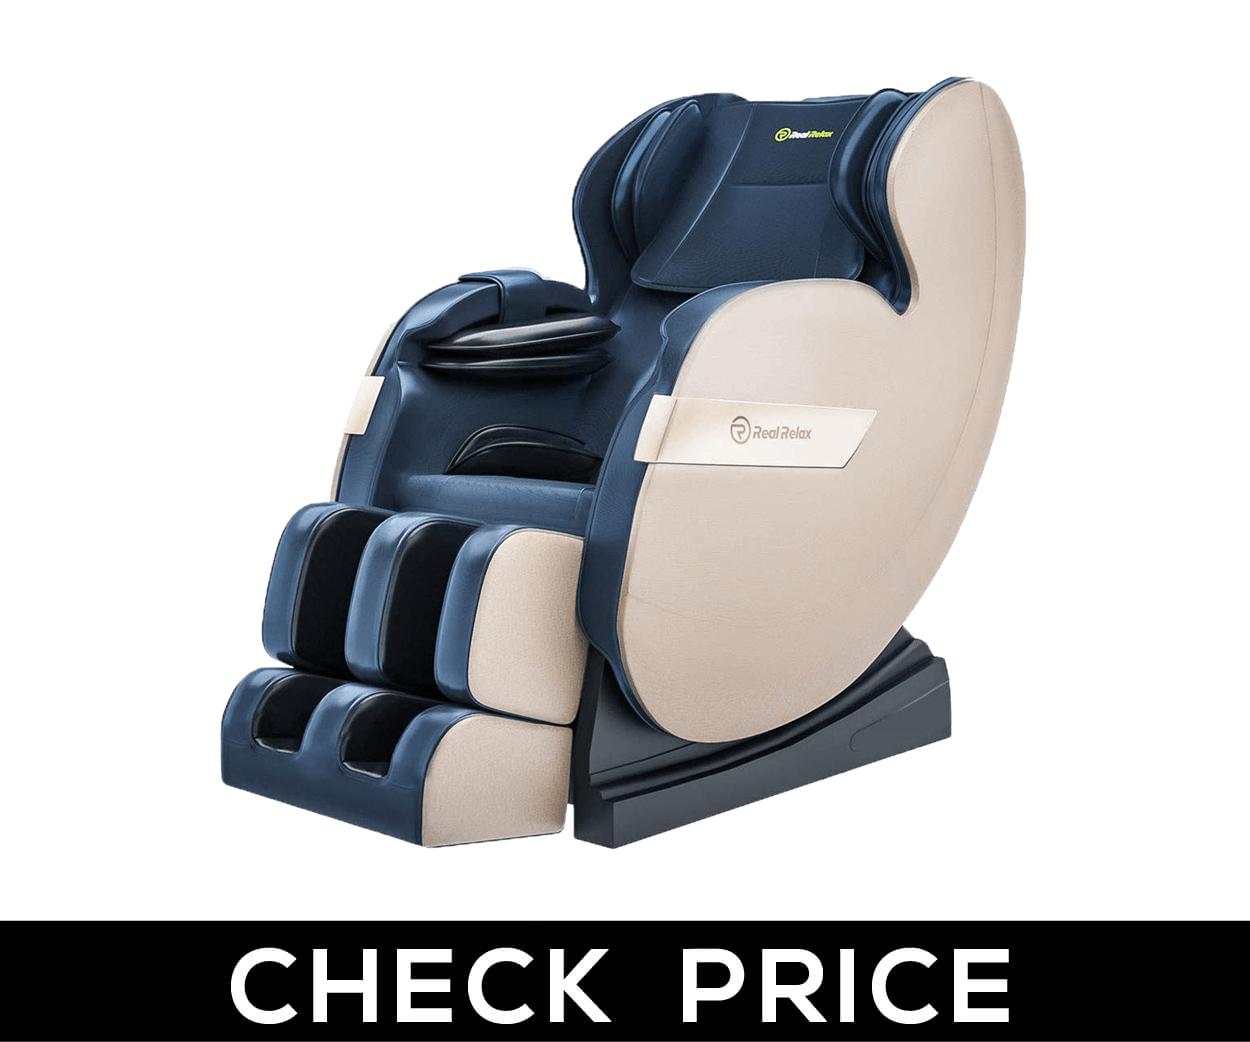 Real Relax – Best for Full Body Zero Gravity Shiatsu Massage